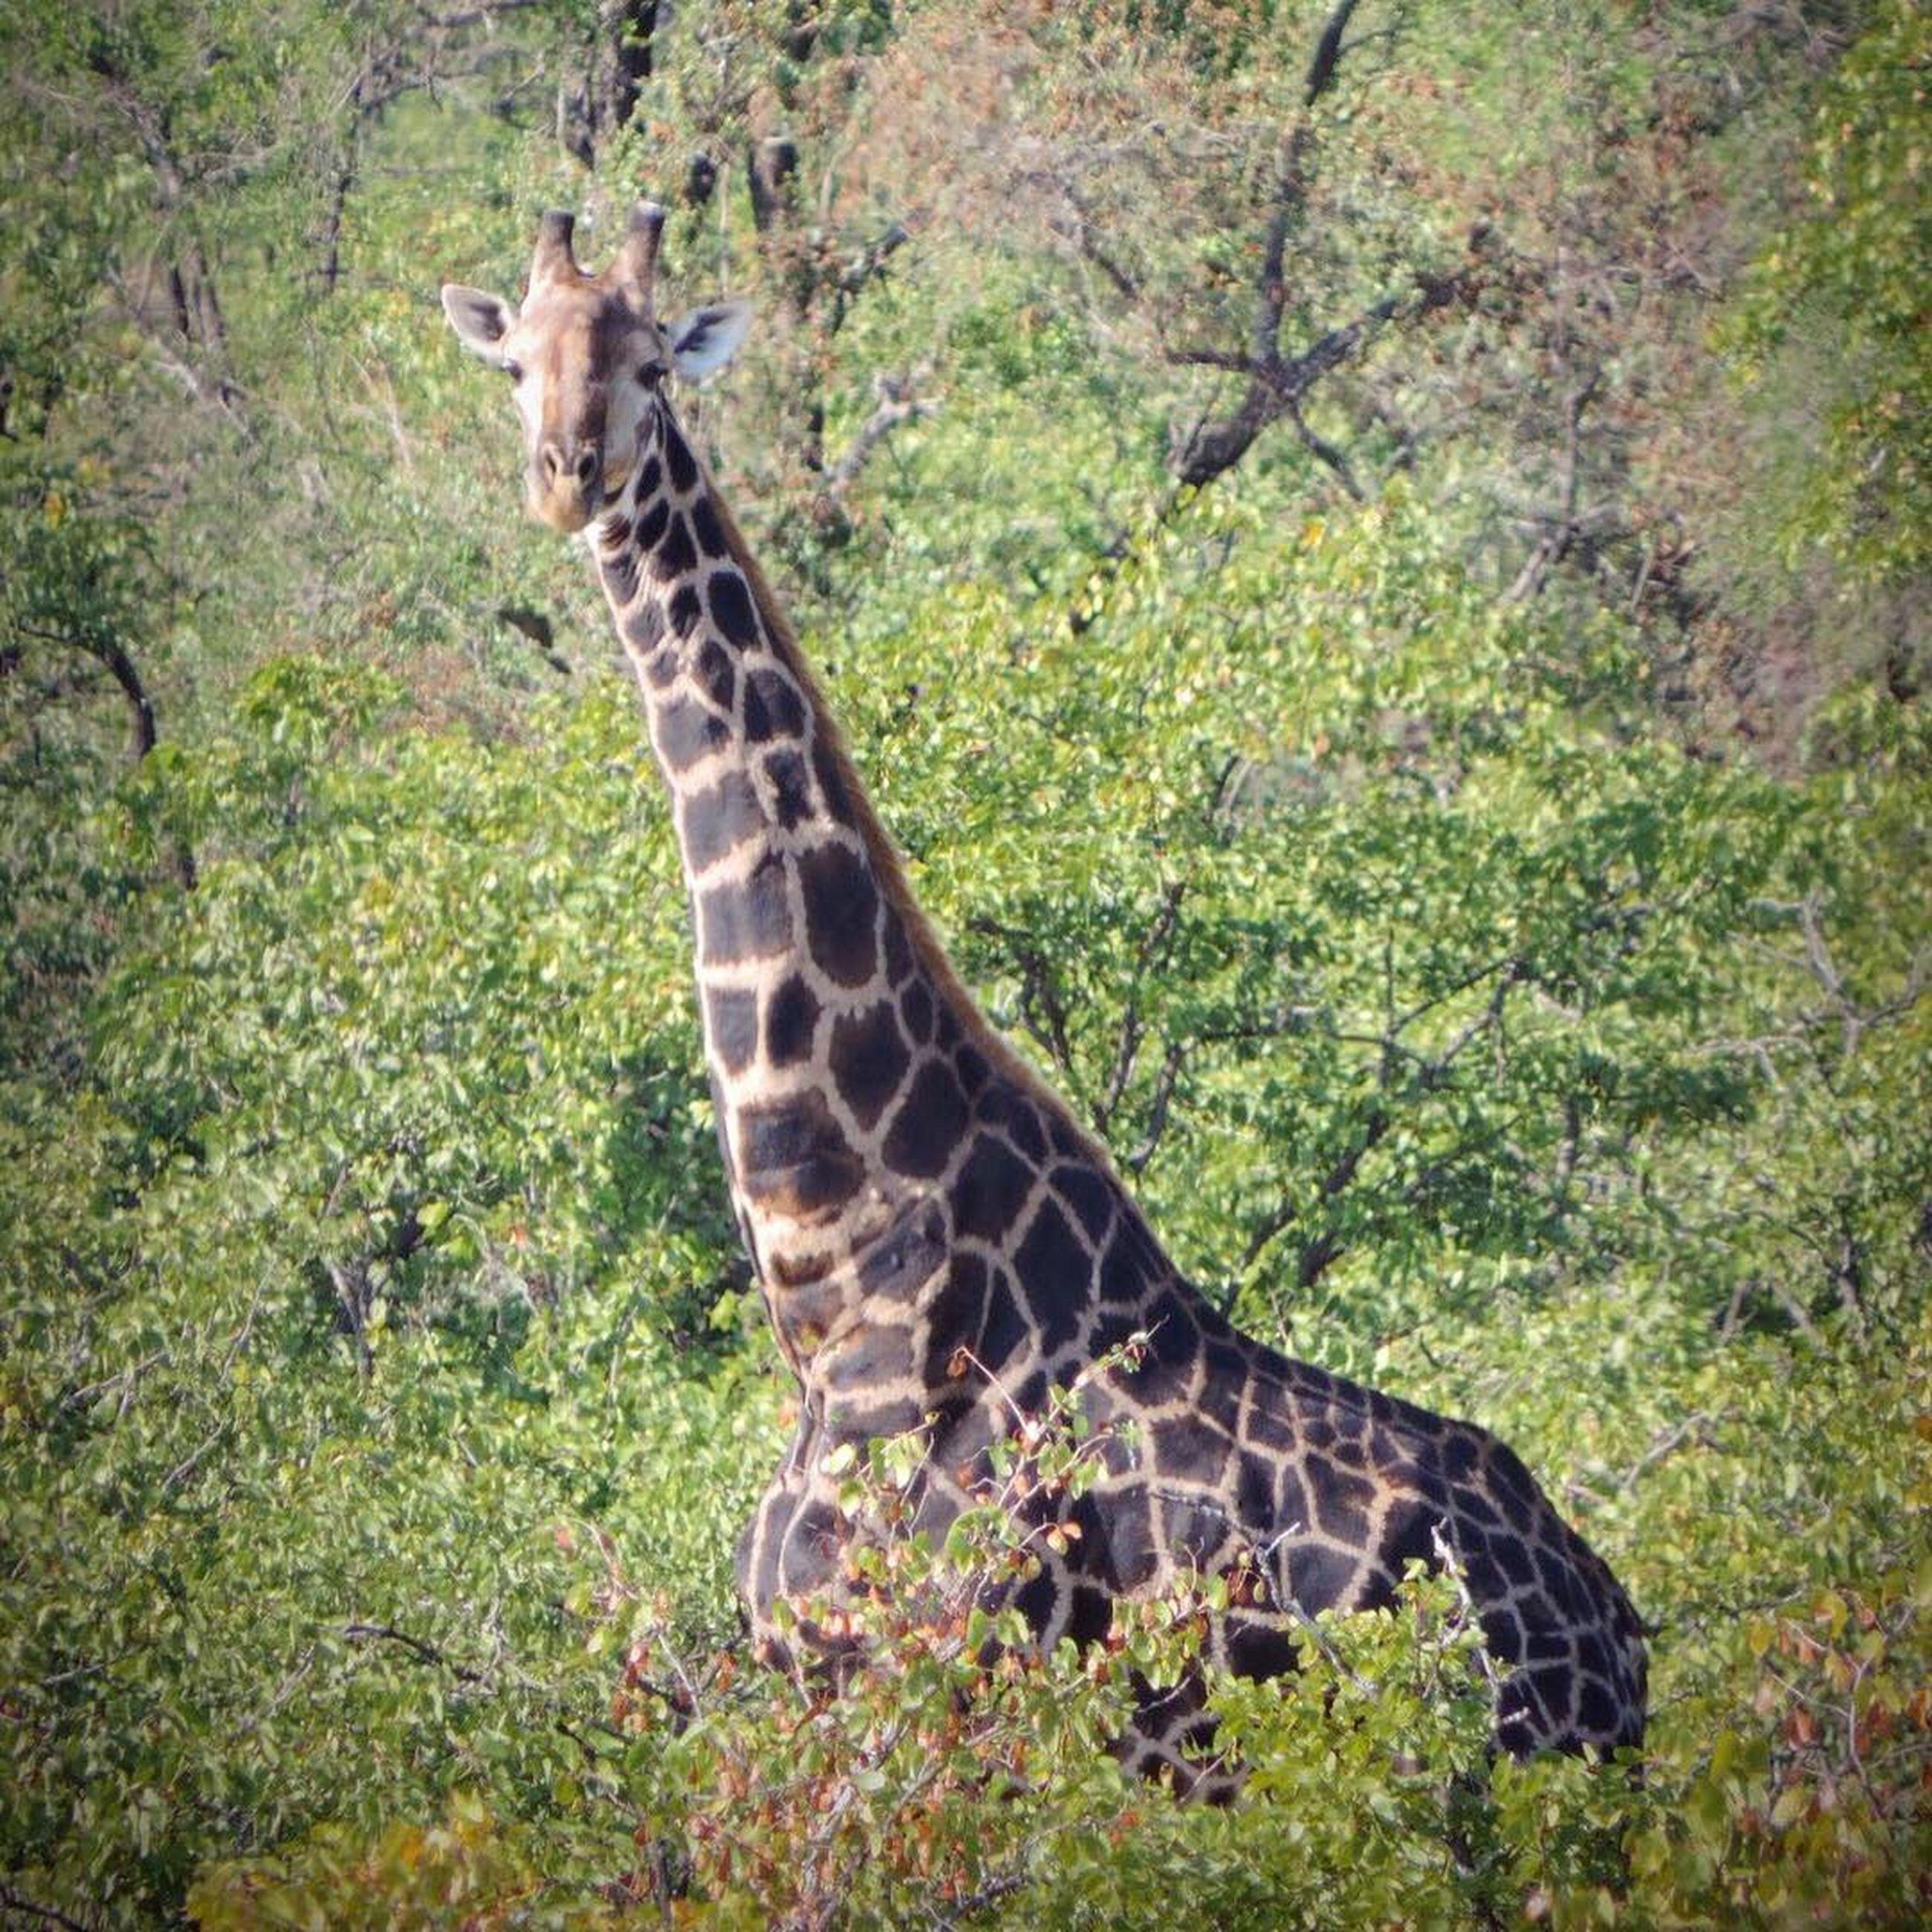 animal wildlife, animals in the wild, animal, animal themes, one animal, plant, mammal, nature, giraffe, safari, no people, tree, day, vertebrate, land, animal markings, natural pattern, grass, forest, animal neck, outdoors, herbivorous